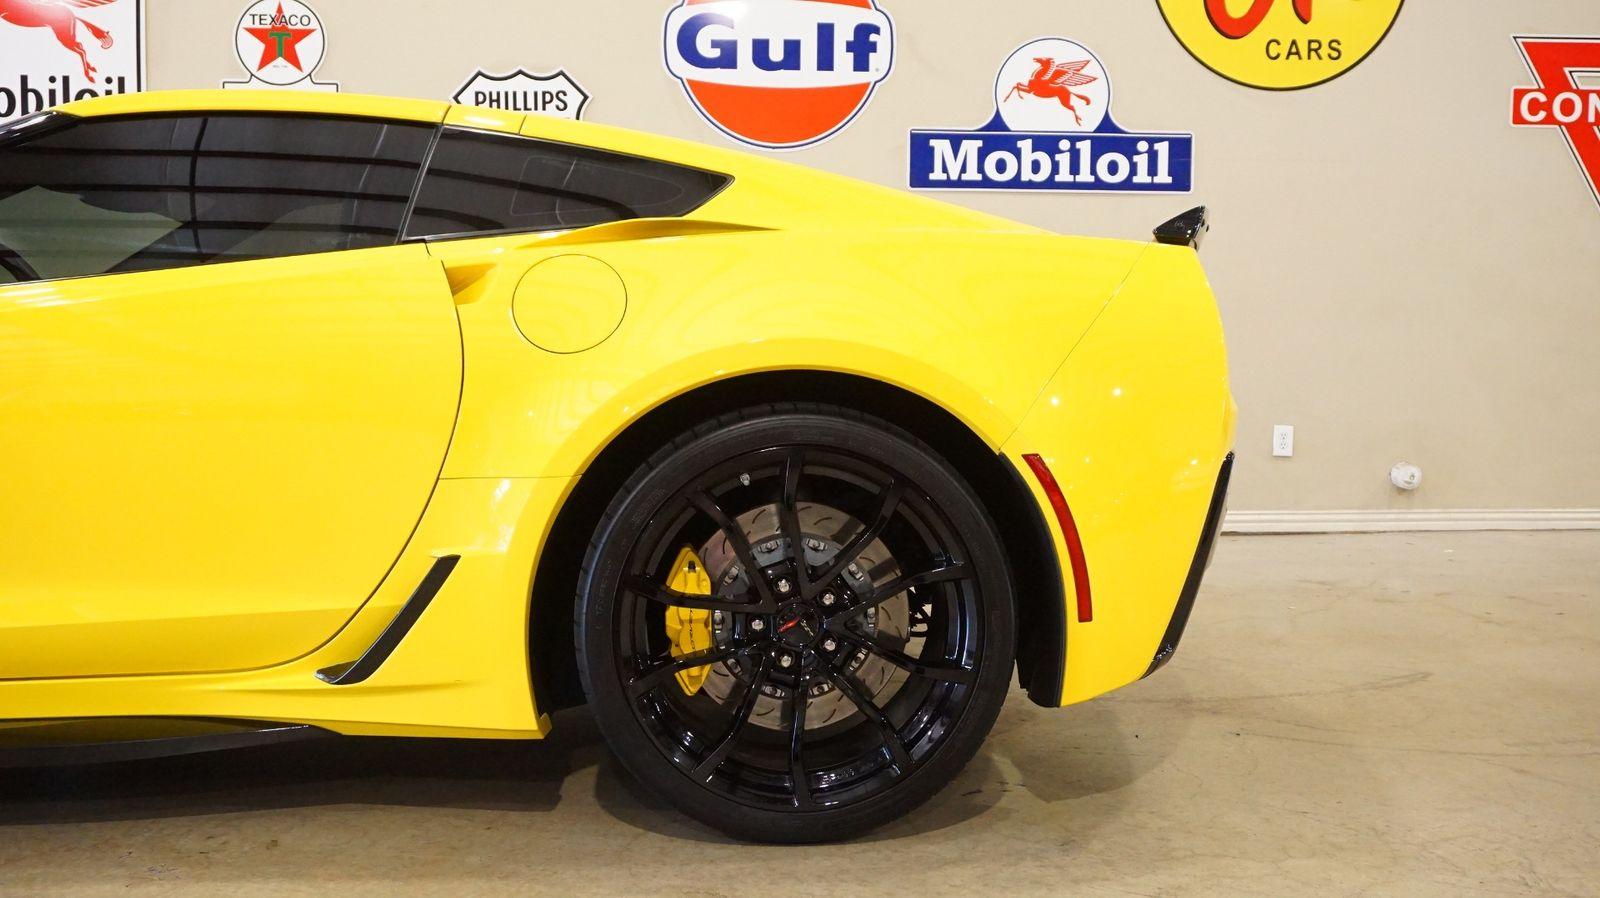 2017 Yellow Chevrolet Corvette Grand Sport 1LT | C7 Corvette Photo 6